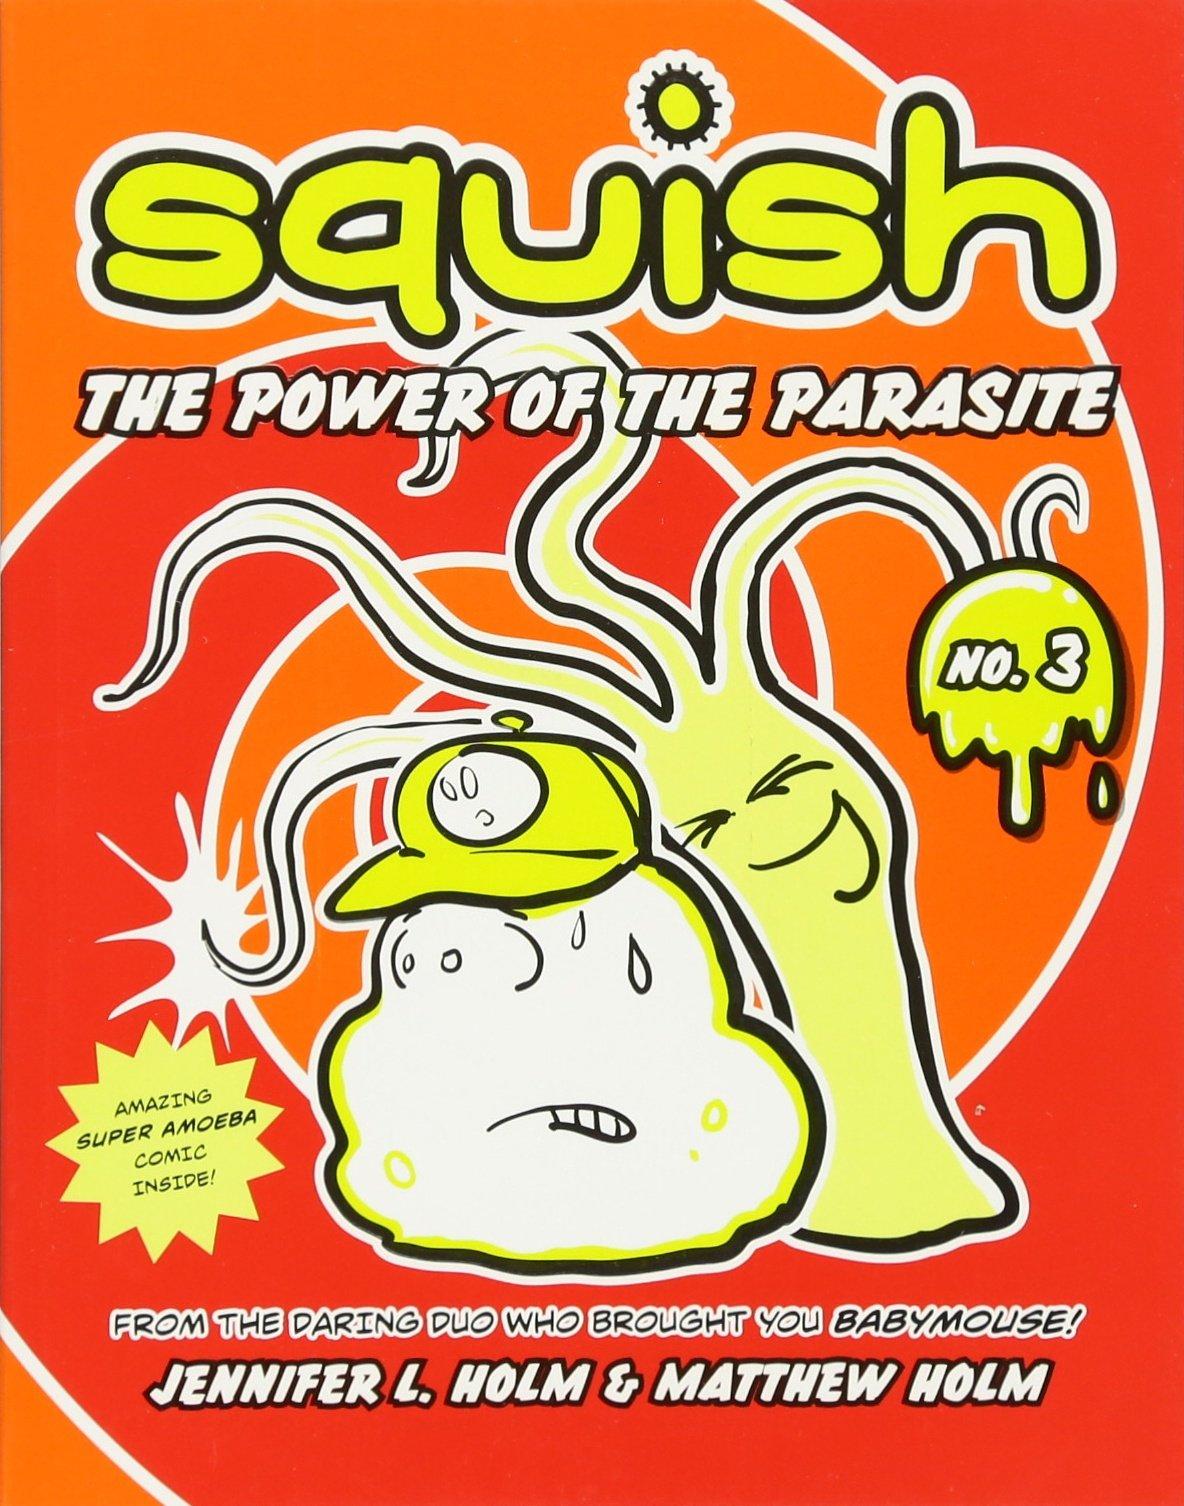 jenni-holm-squish-power-parasite.jpg